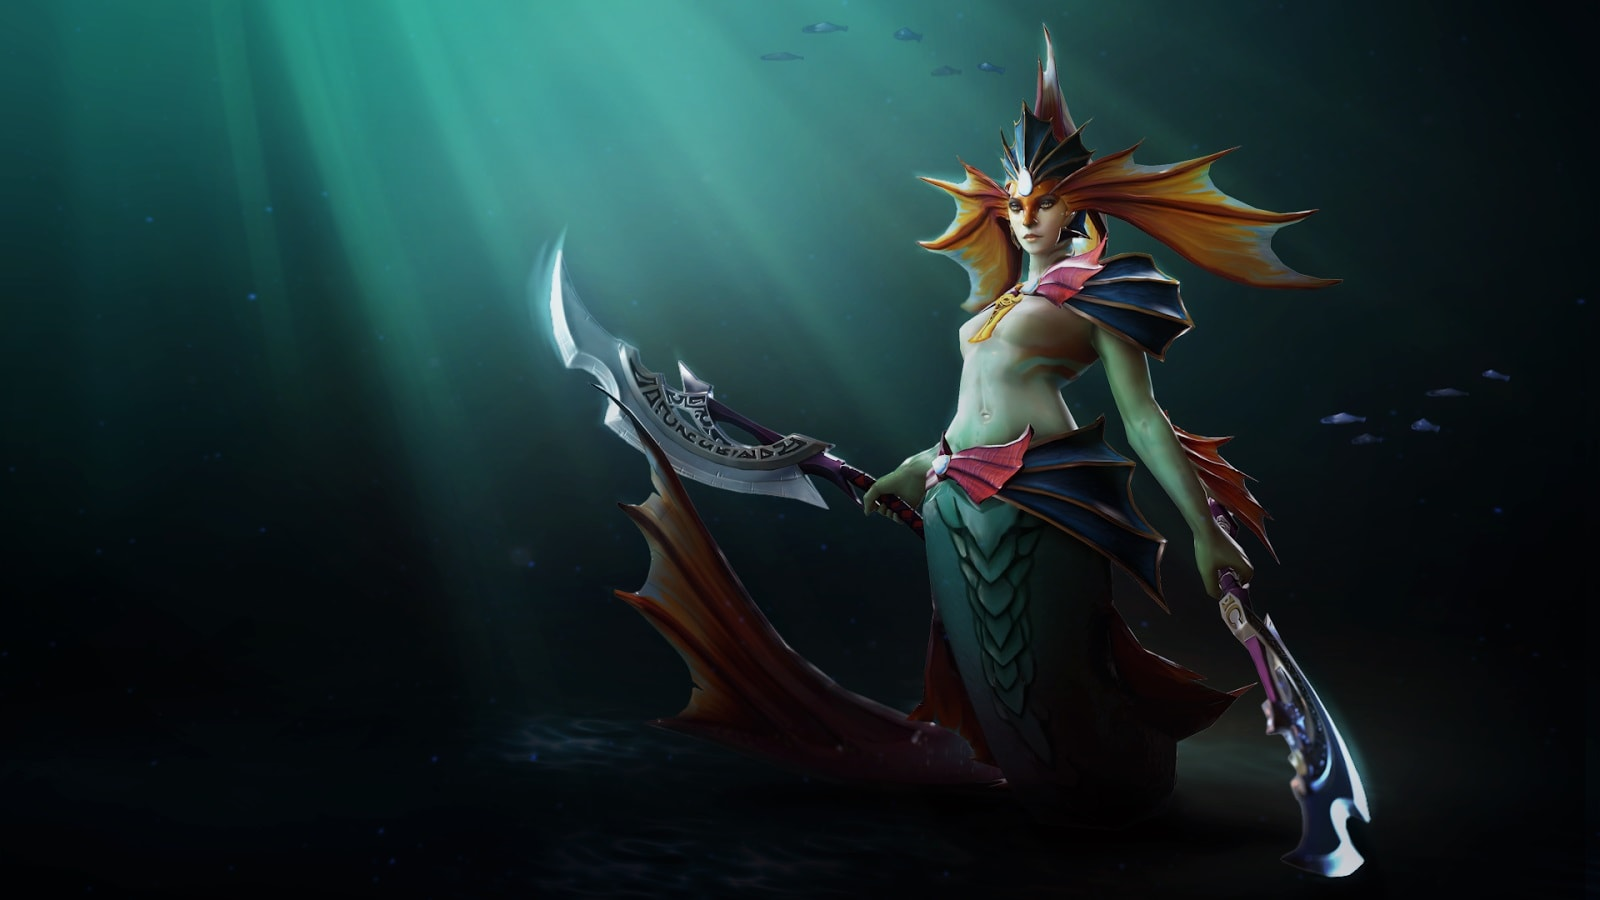 Dota2 : Naga Siren widescreen wallpapers